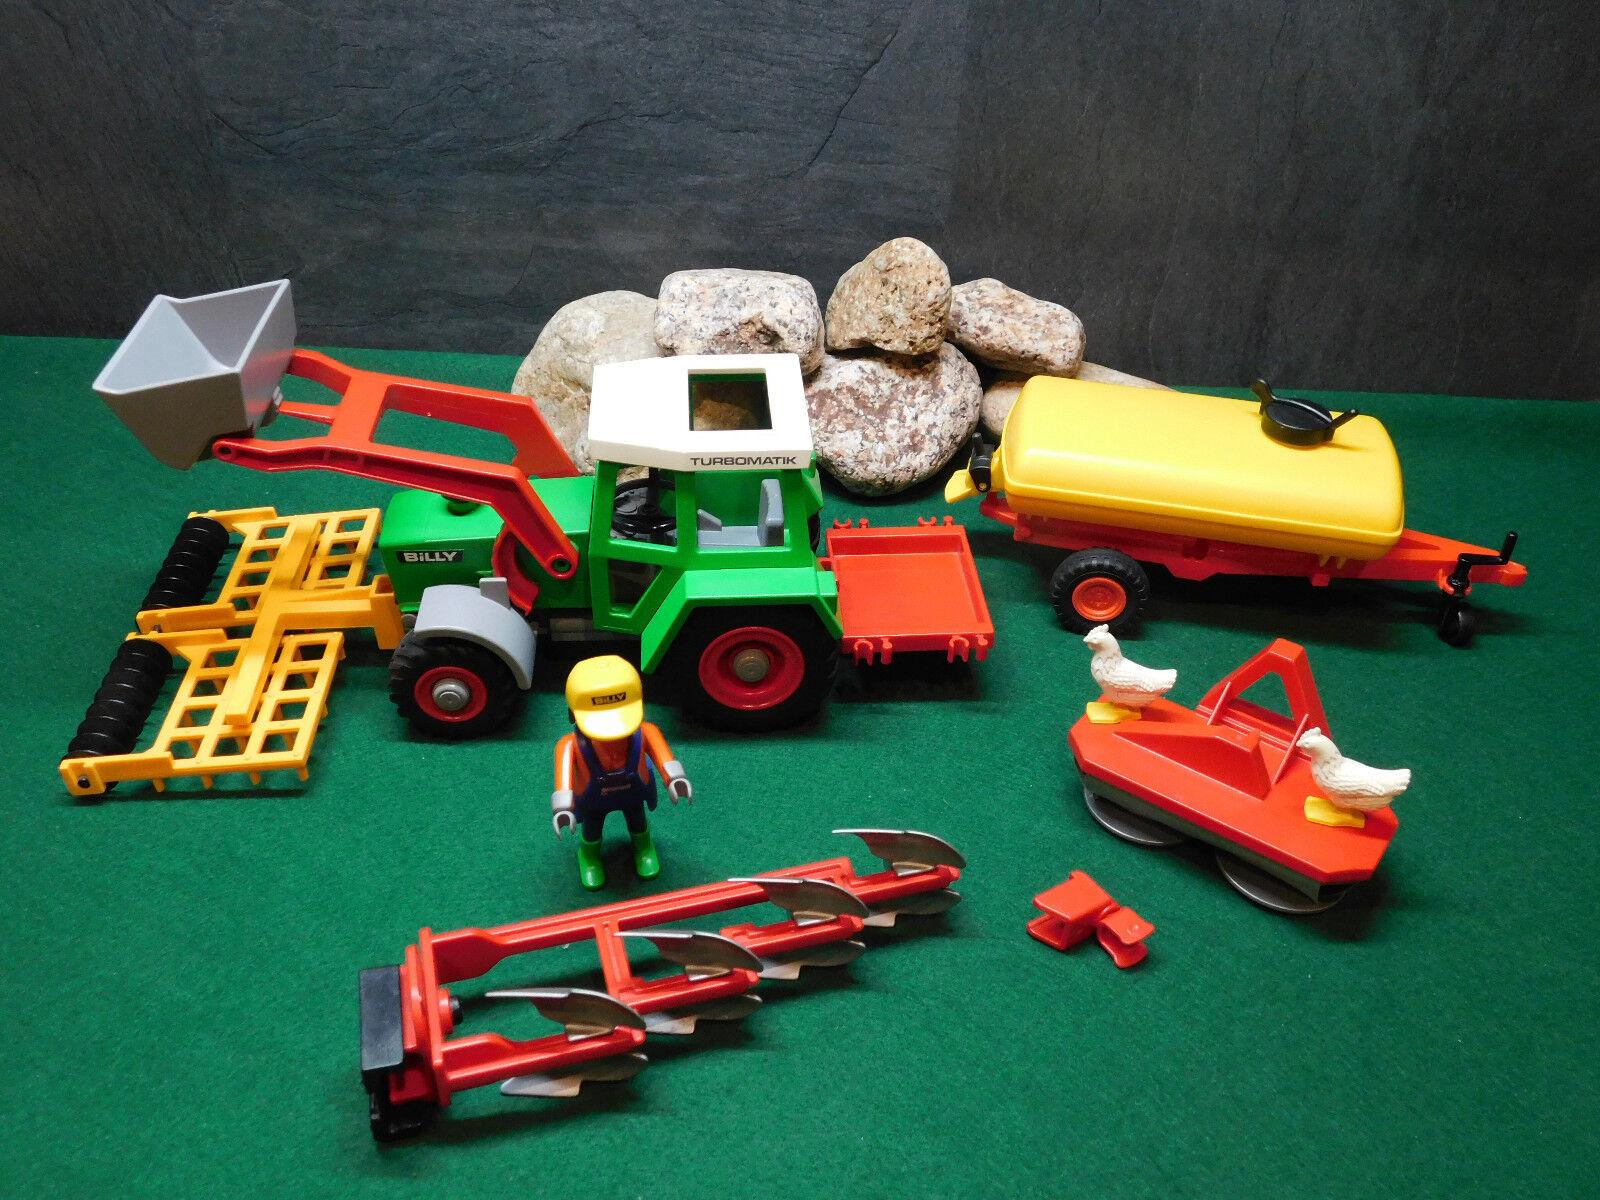 Playmobil Großes Traktor Billy Set 3718-A 1992 Düngerfaß aus 3502-A 78 ohne OVP